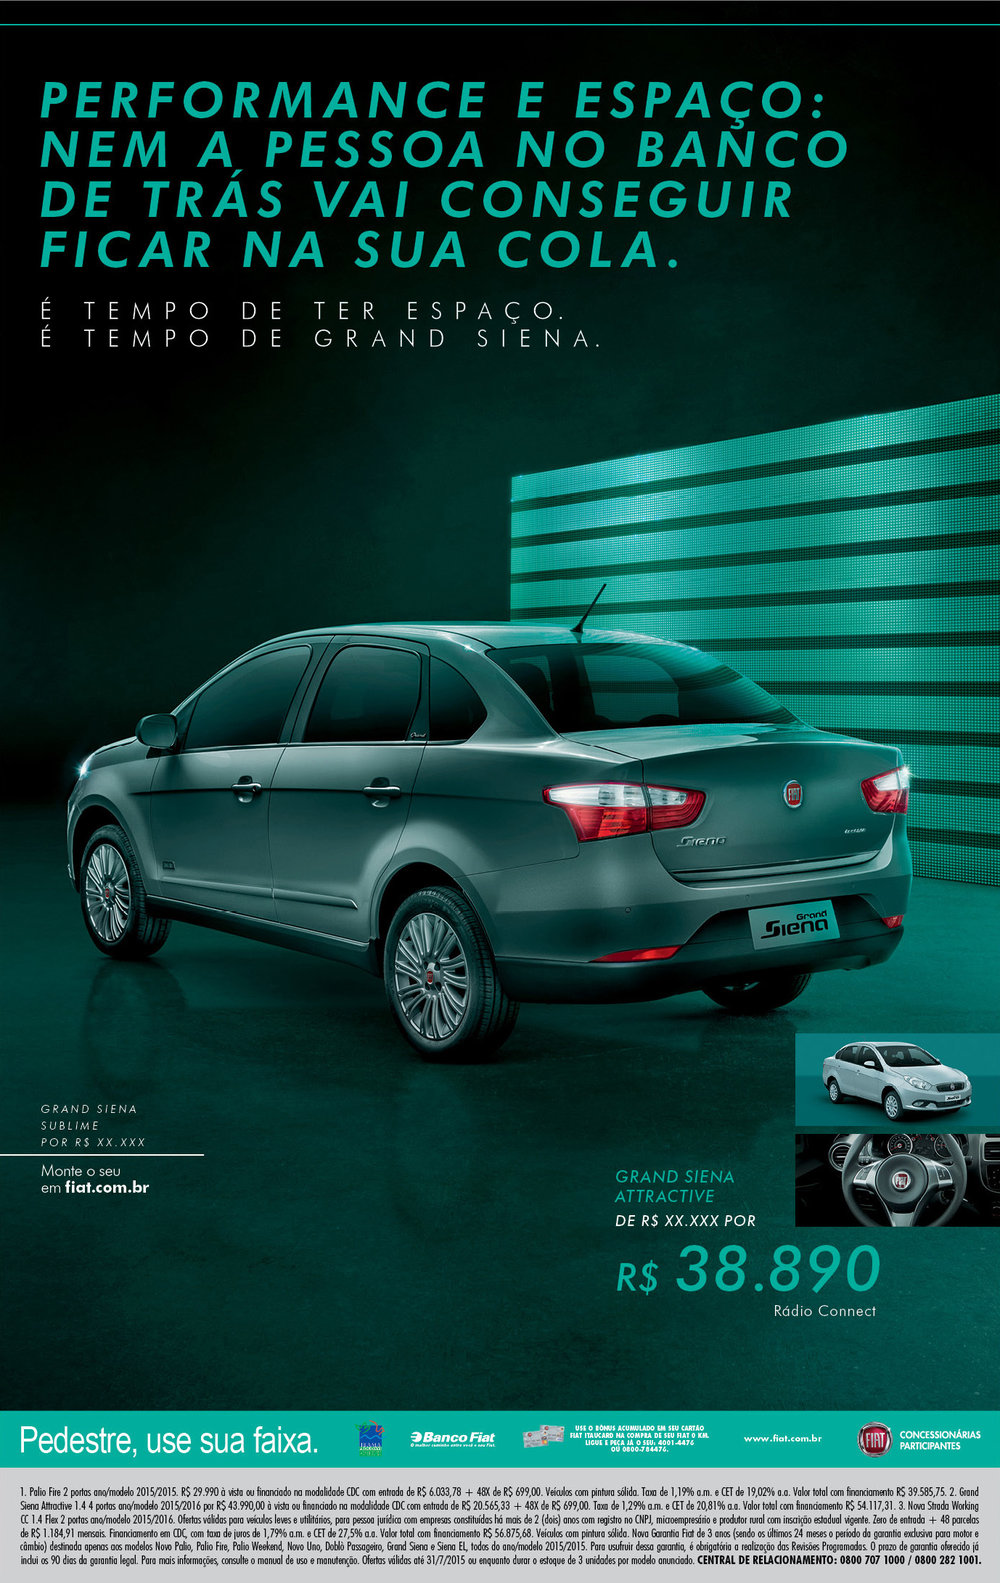 36949-109-Fiat-EtempoDeFiat-GranSiena2017-KV-26.4x402 copy2.jpg